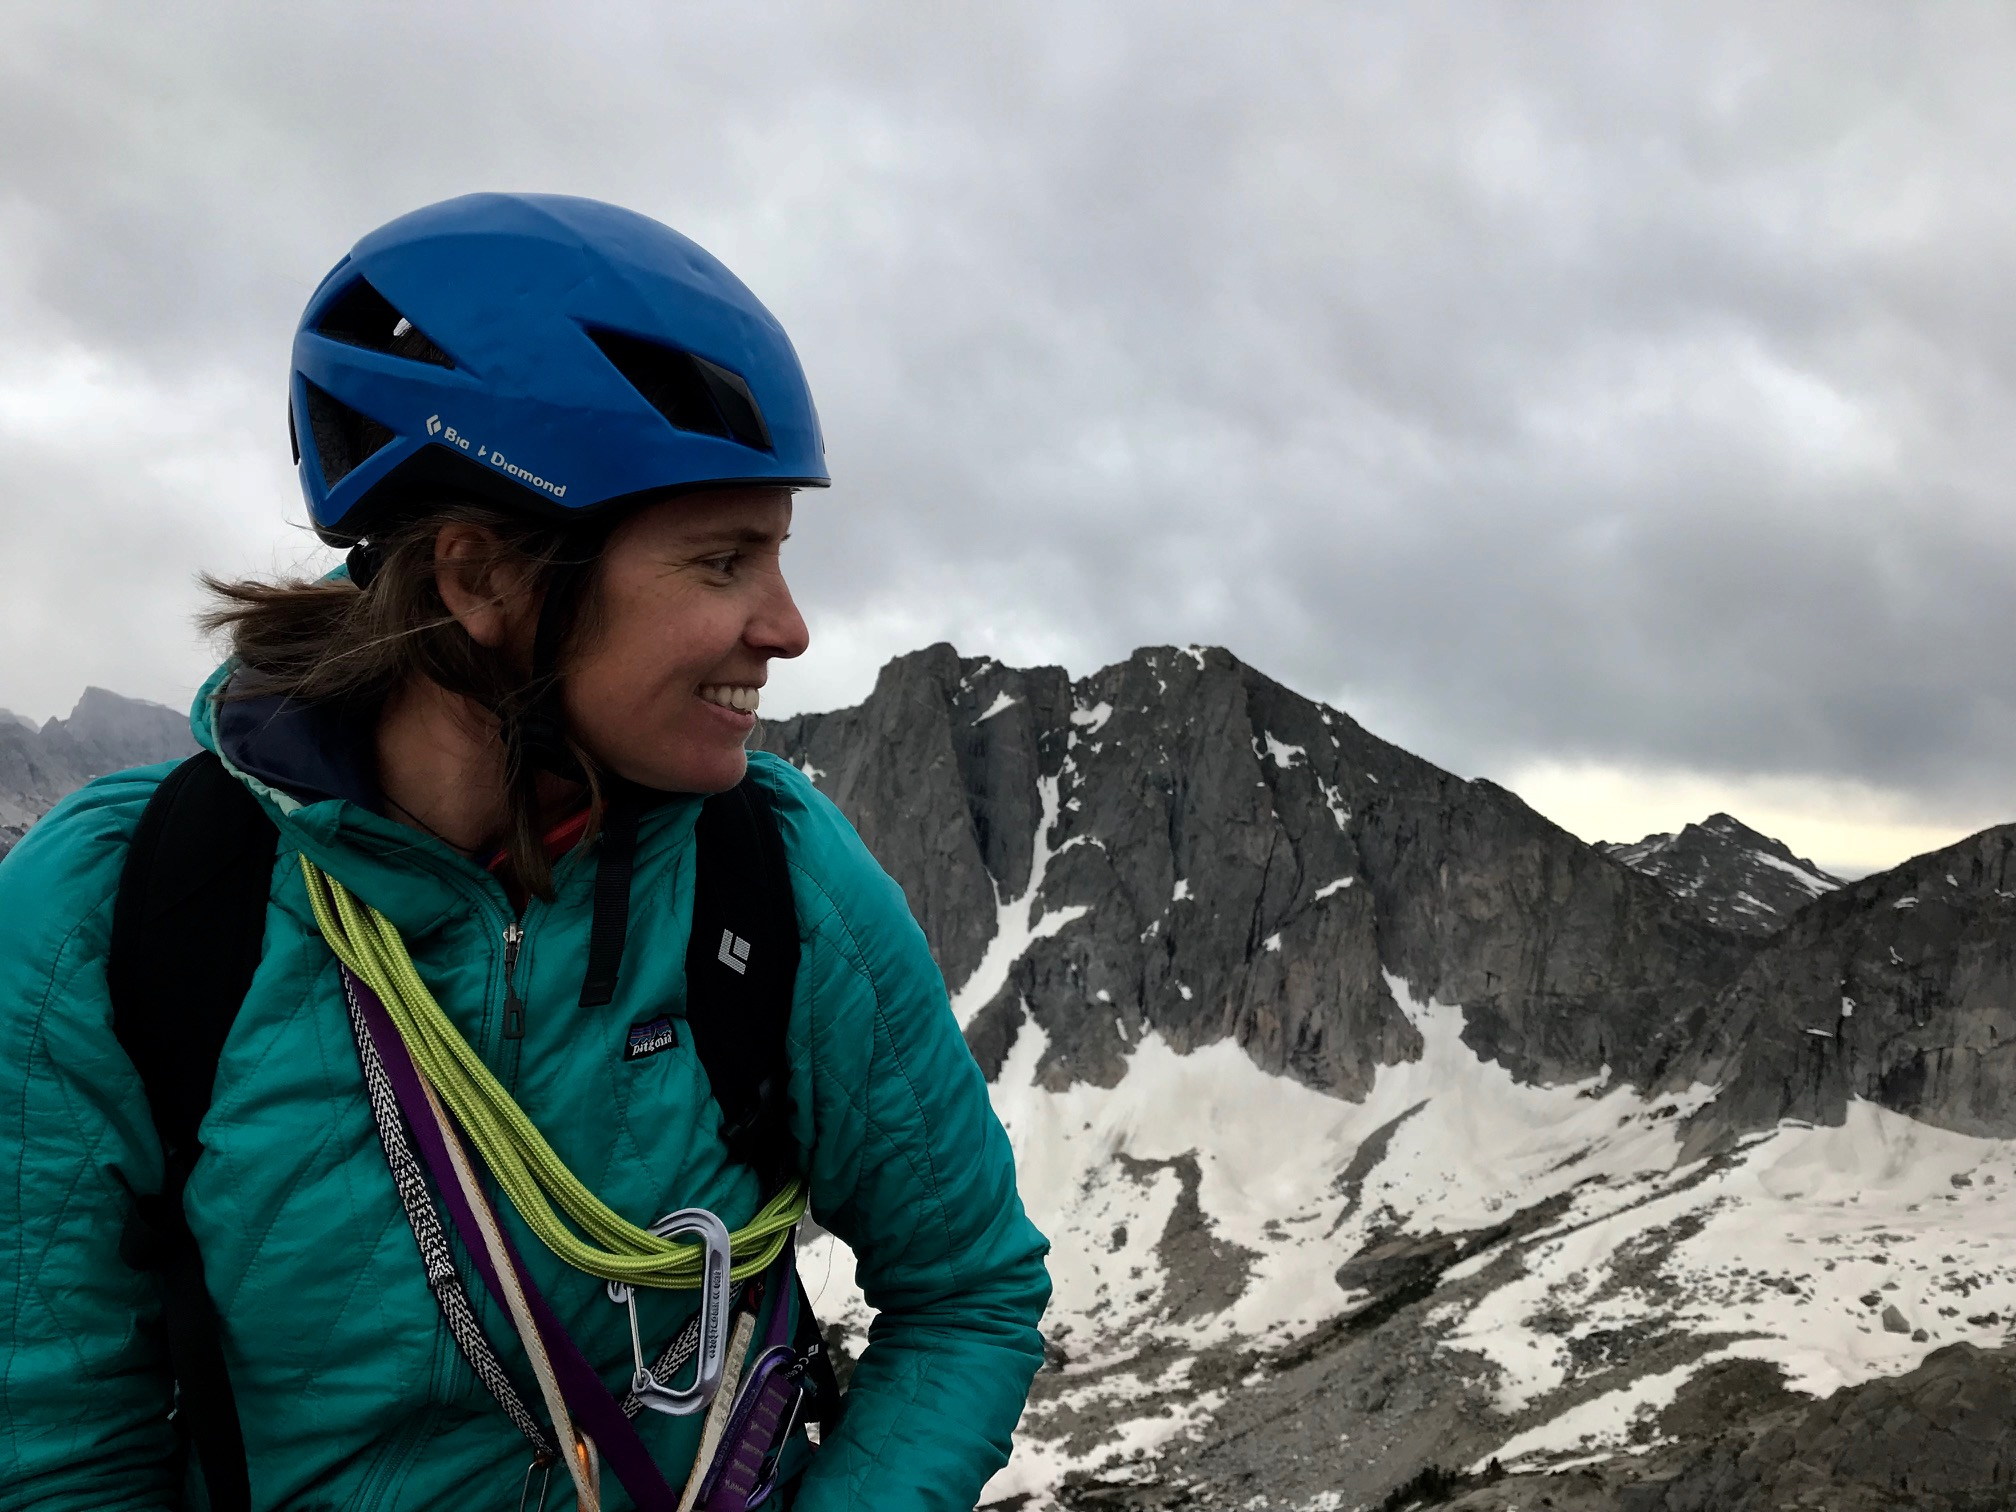 Sara taking in the view on top of Pingora Peak